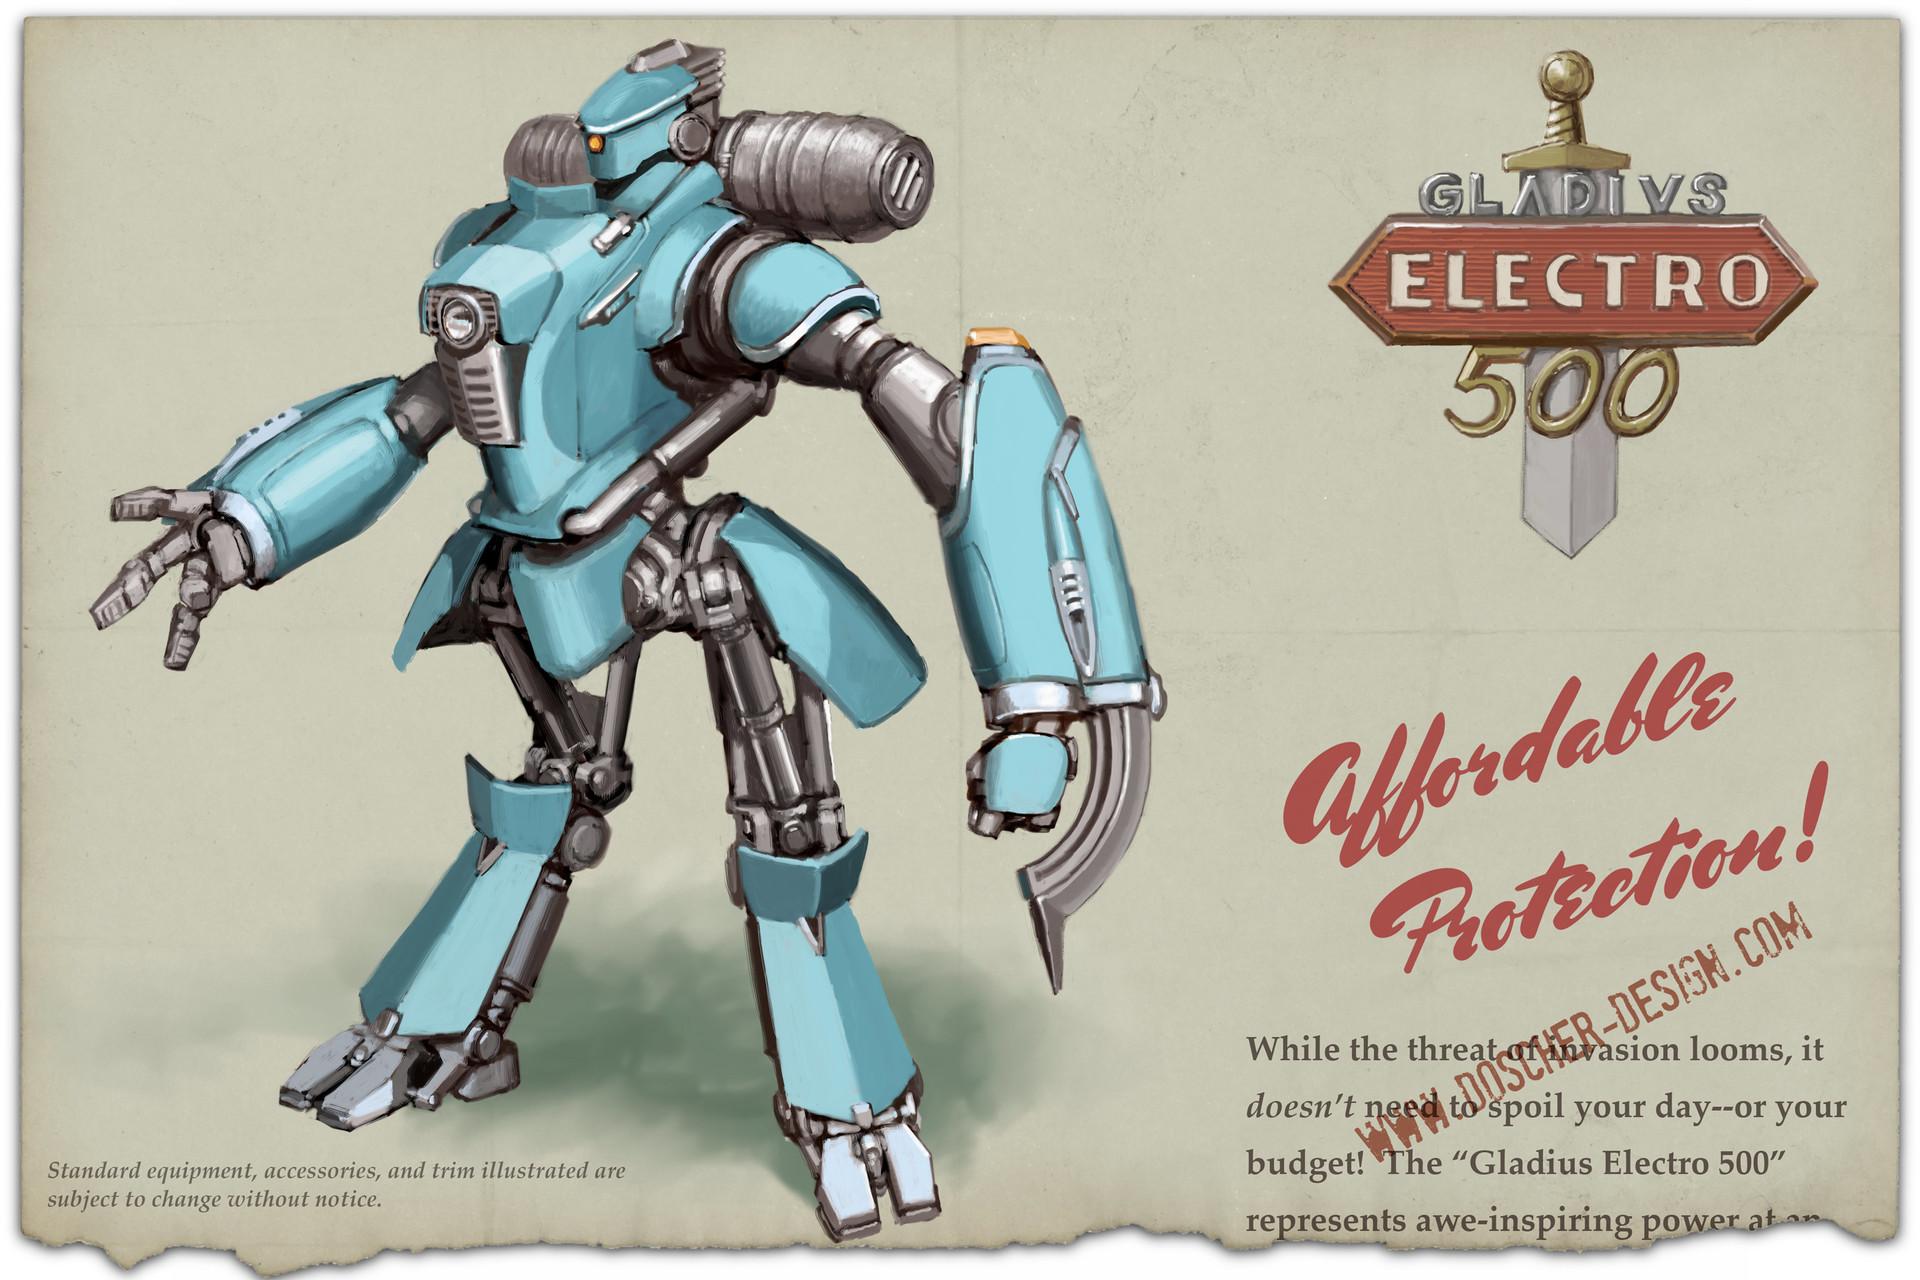 Gladius Electro 500